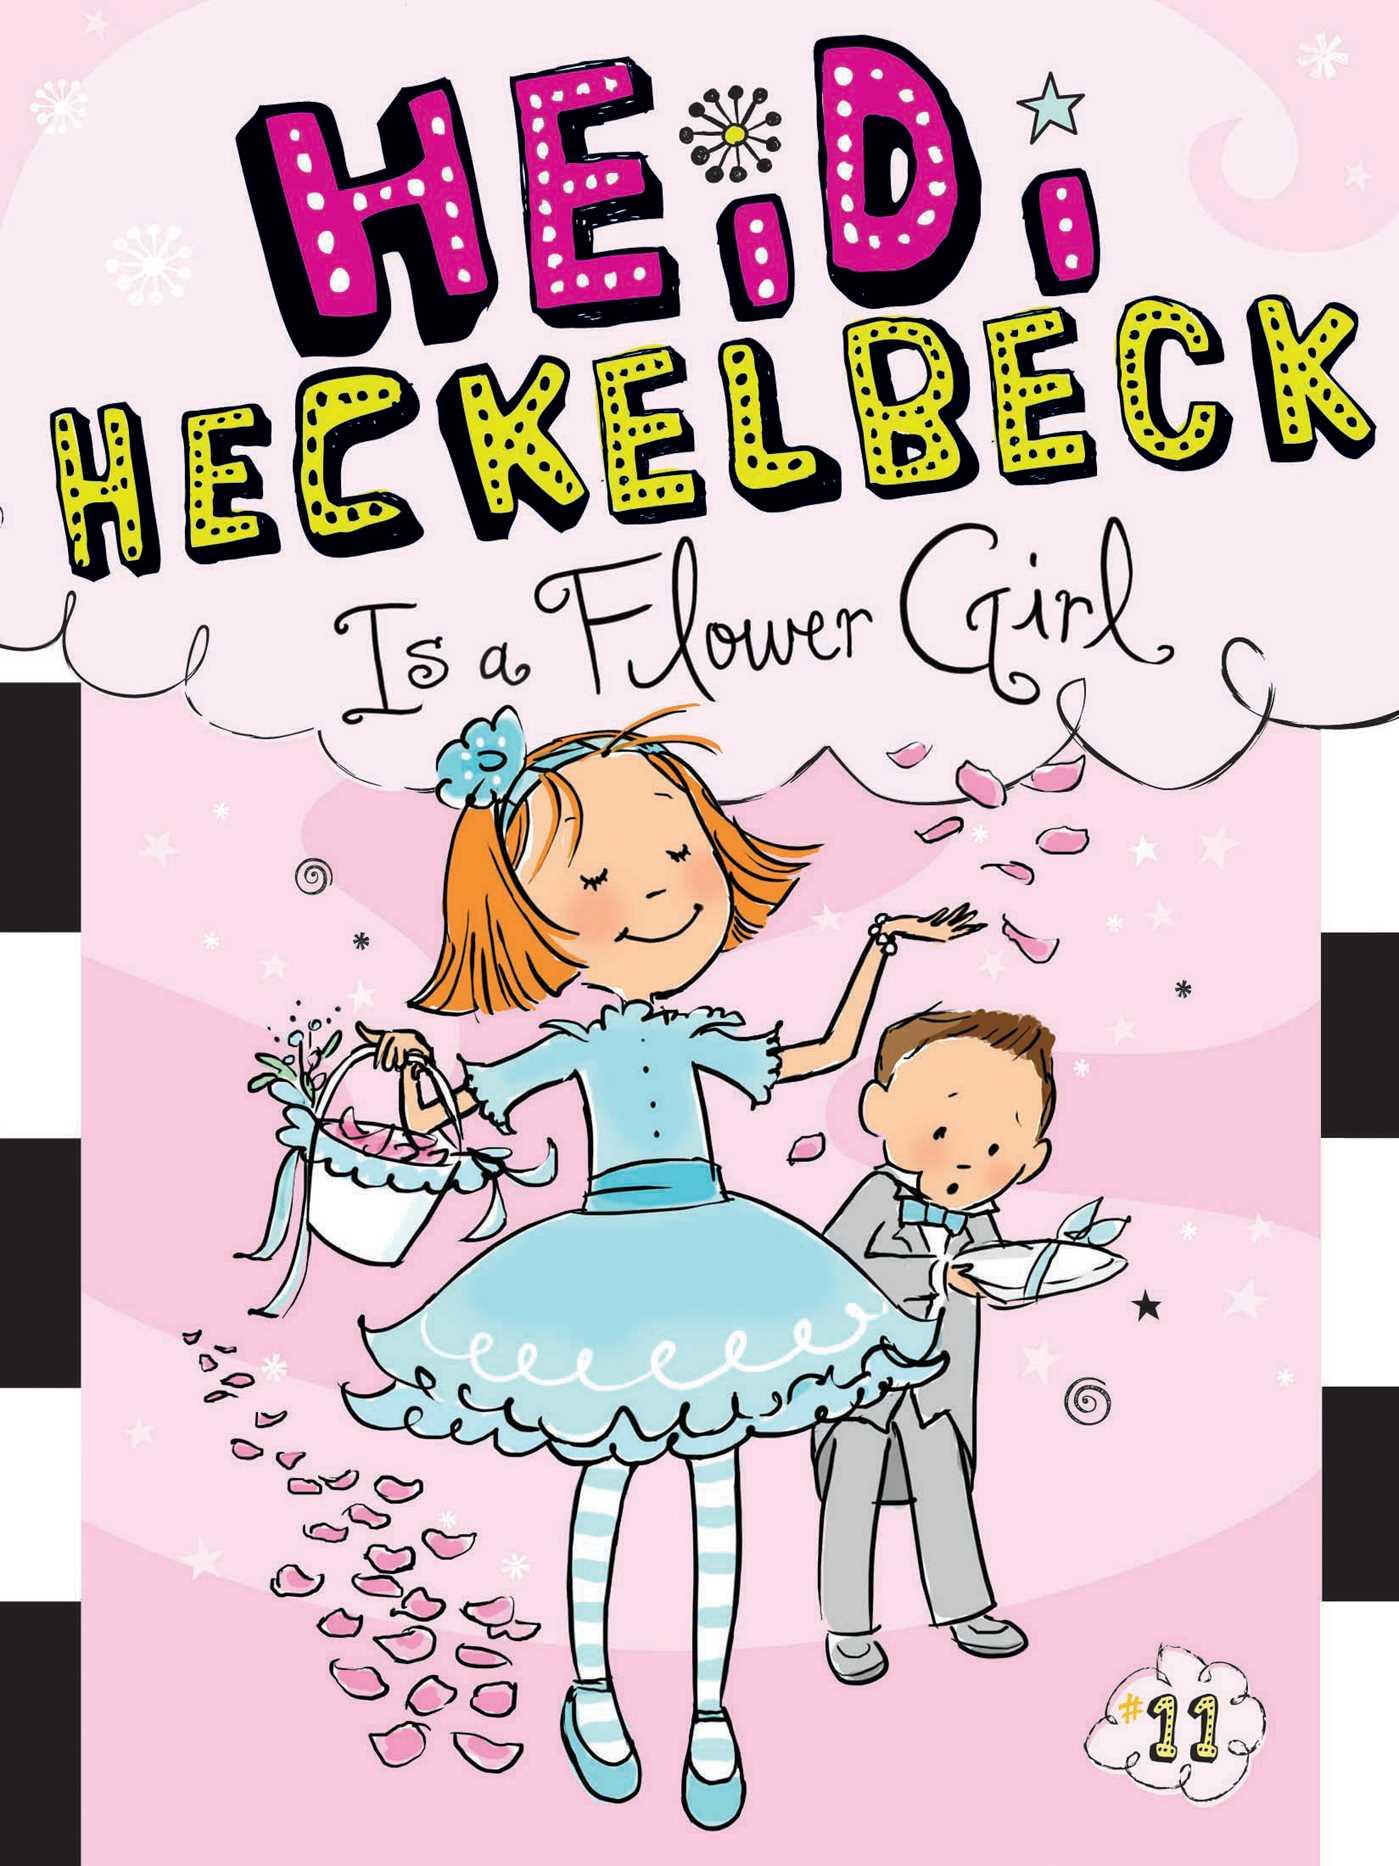 Heidi heckelbeck is a flower girl 9781481404983 hr